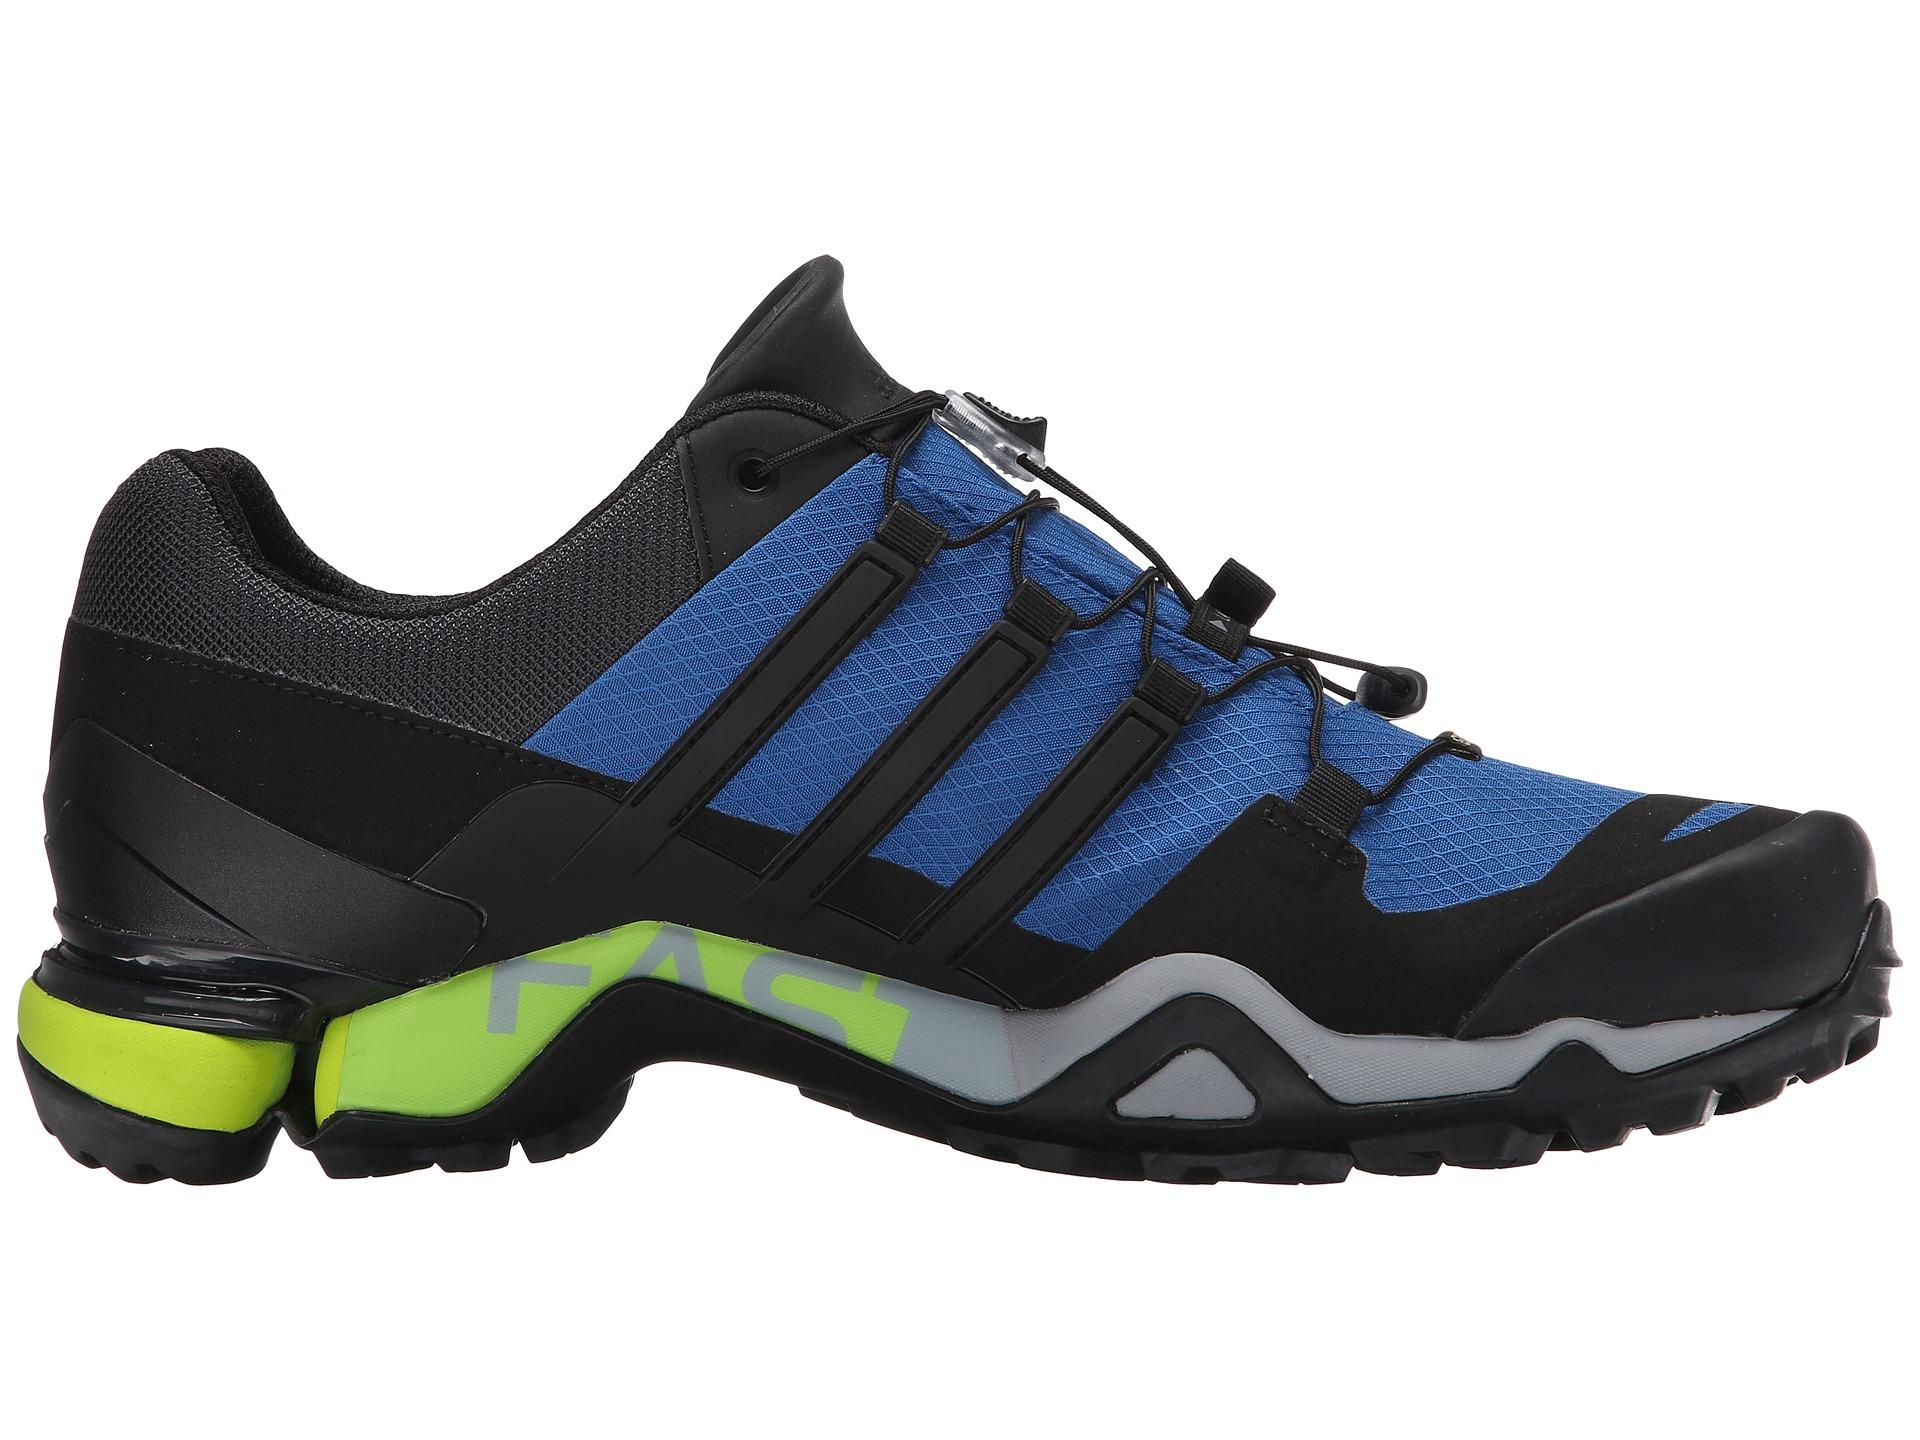 Adidas Outdoor Ortholite